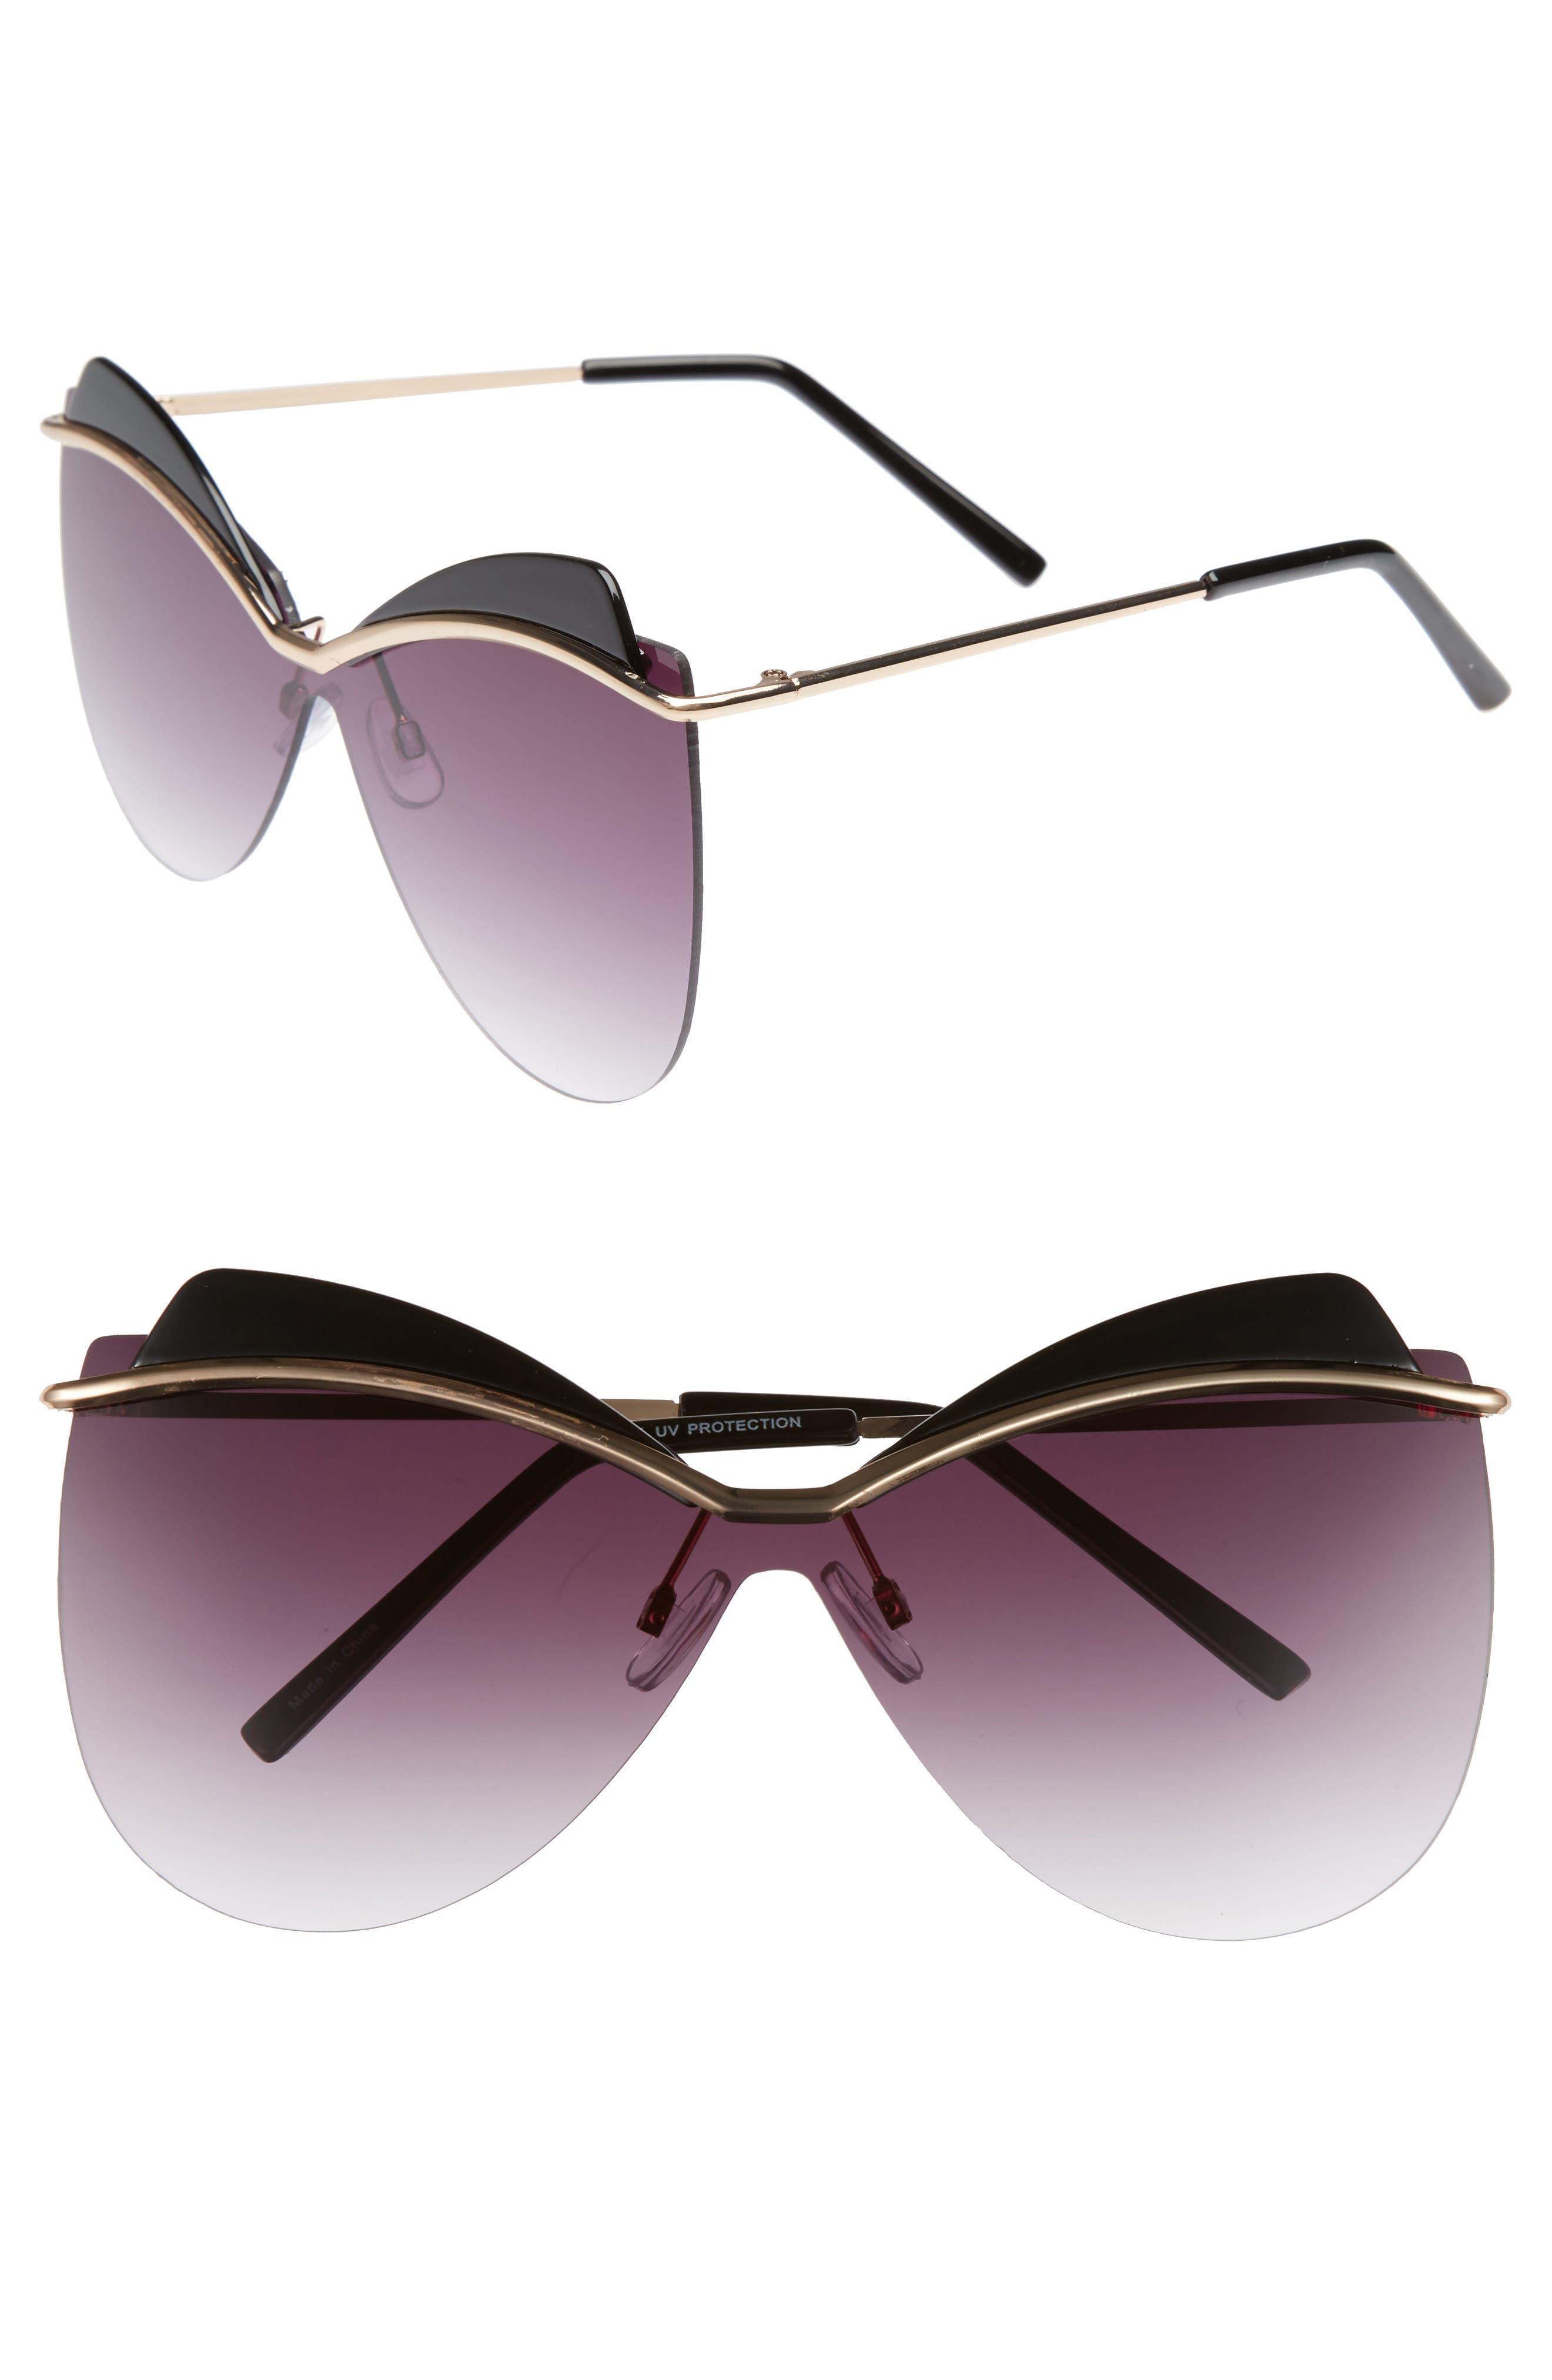 65mm Rimless Shield Sunglasses,                             Main thumbnail 1, color,                             Black/ Gold